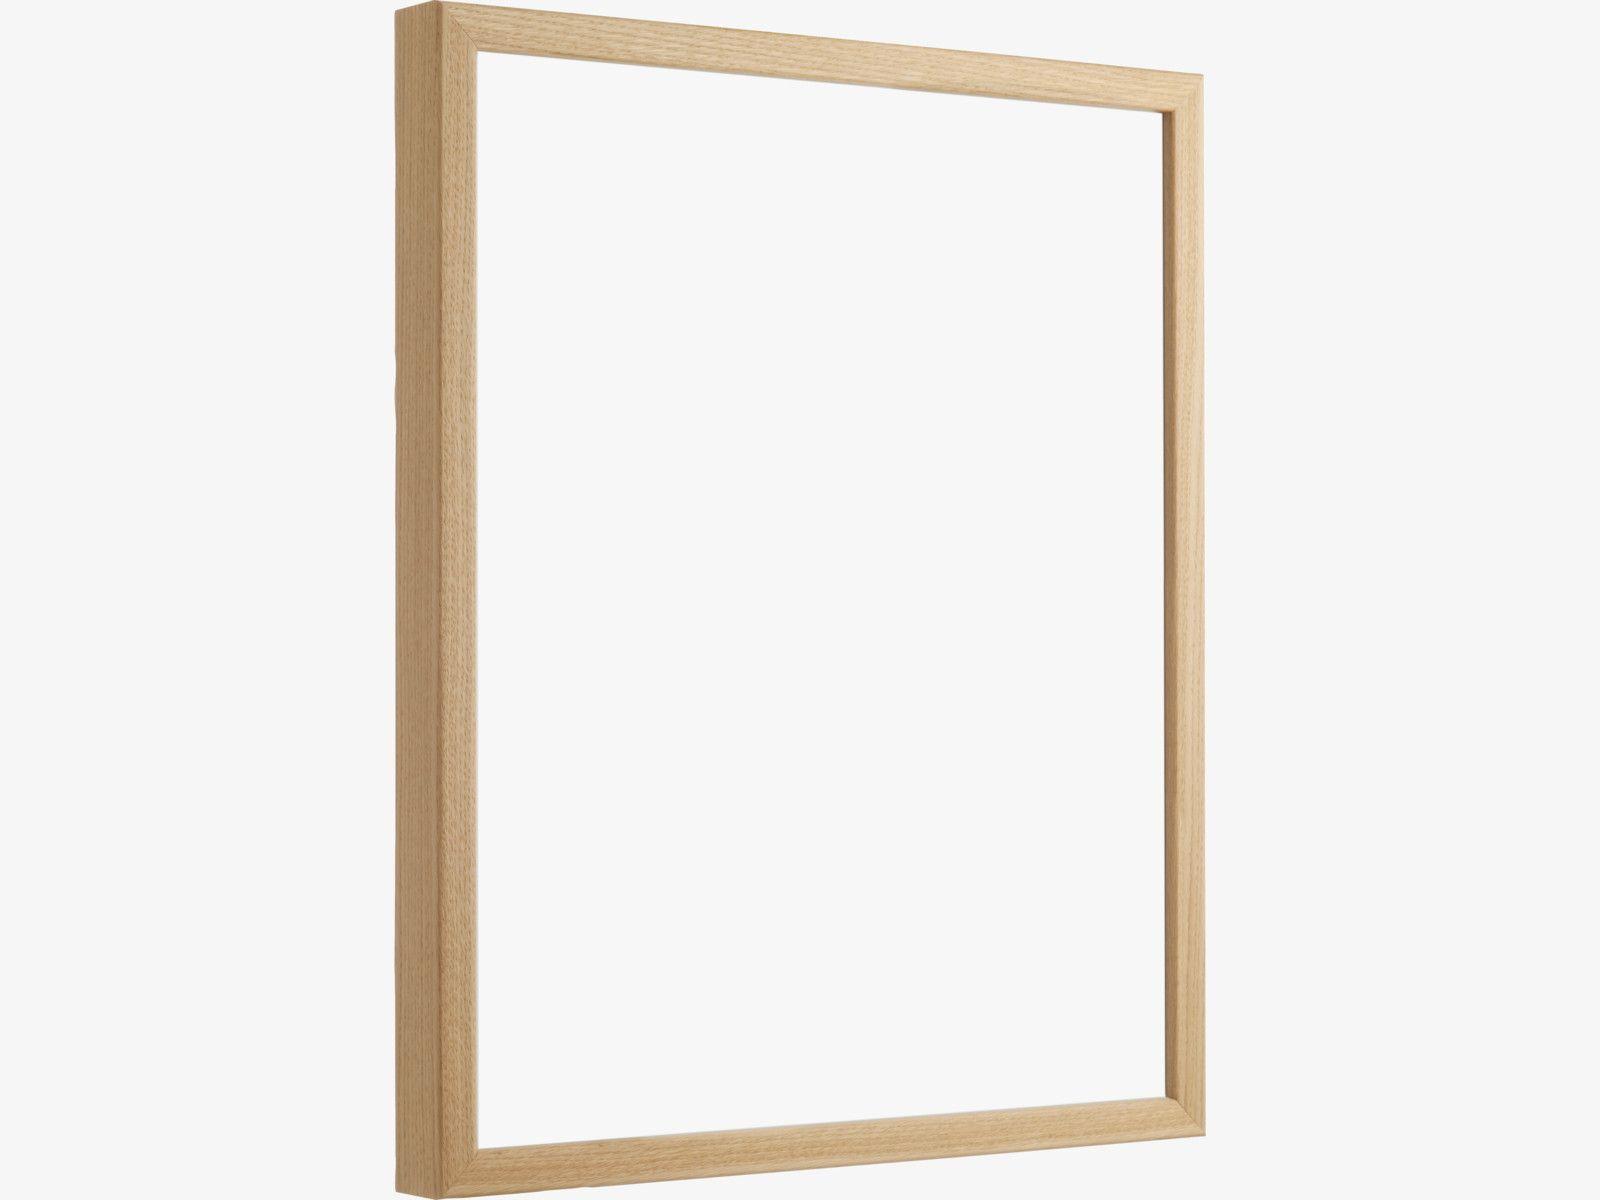 leven natural wood 40 x 50cm 16 x 20 oak picture frame habitatuk